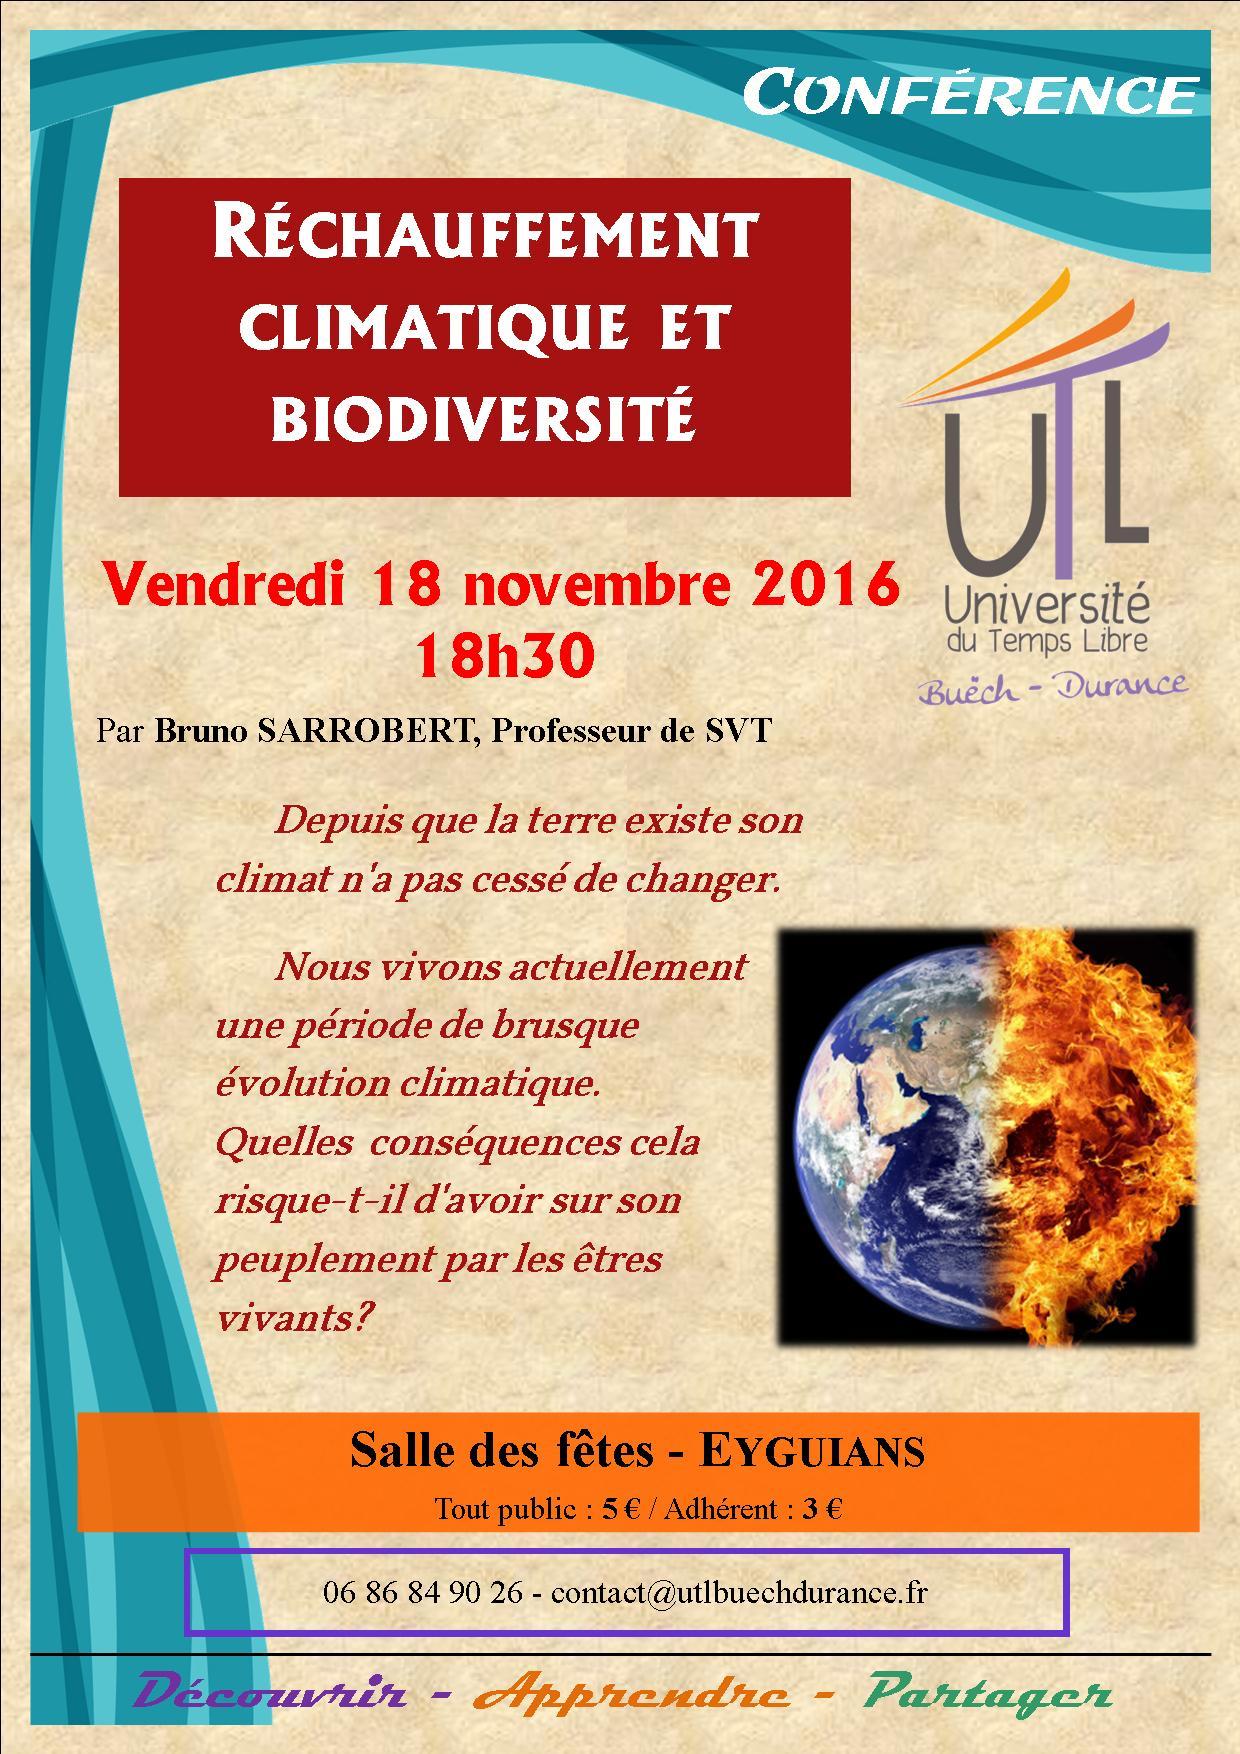 2016-11-18-rechauffement-climatique-et-biodiversite